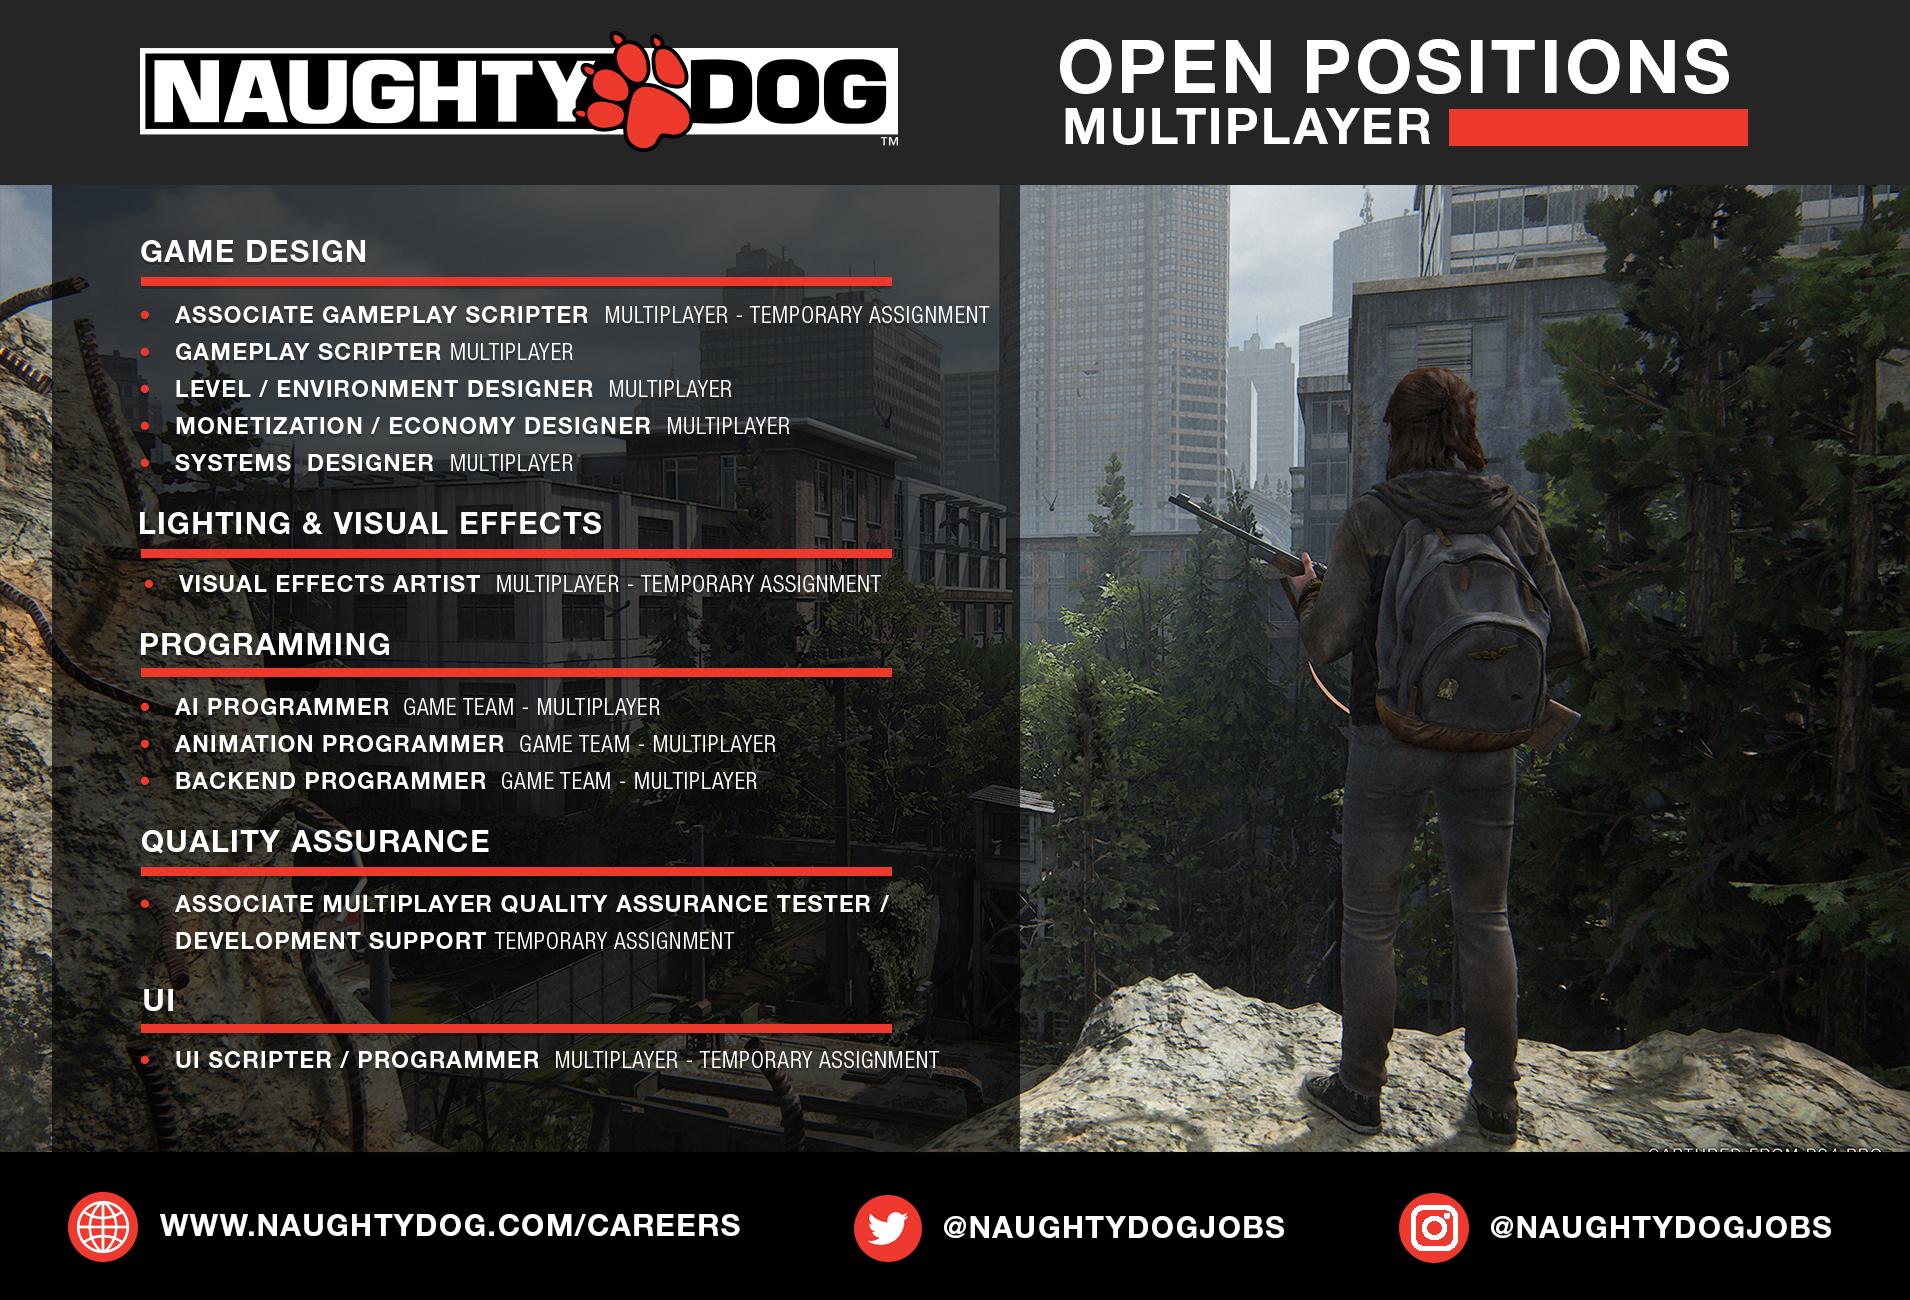 Naughty Dog contrata para multiplayer